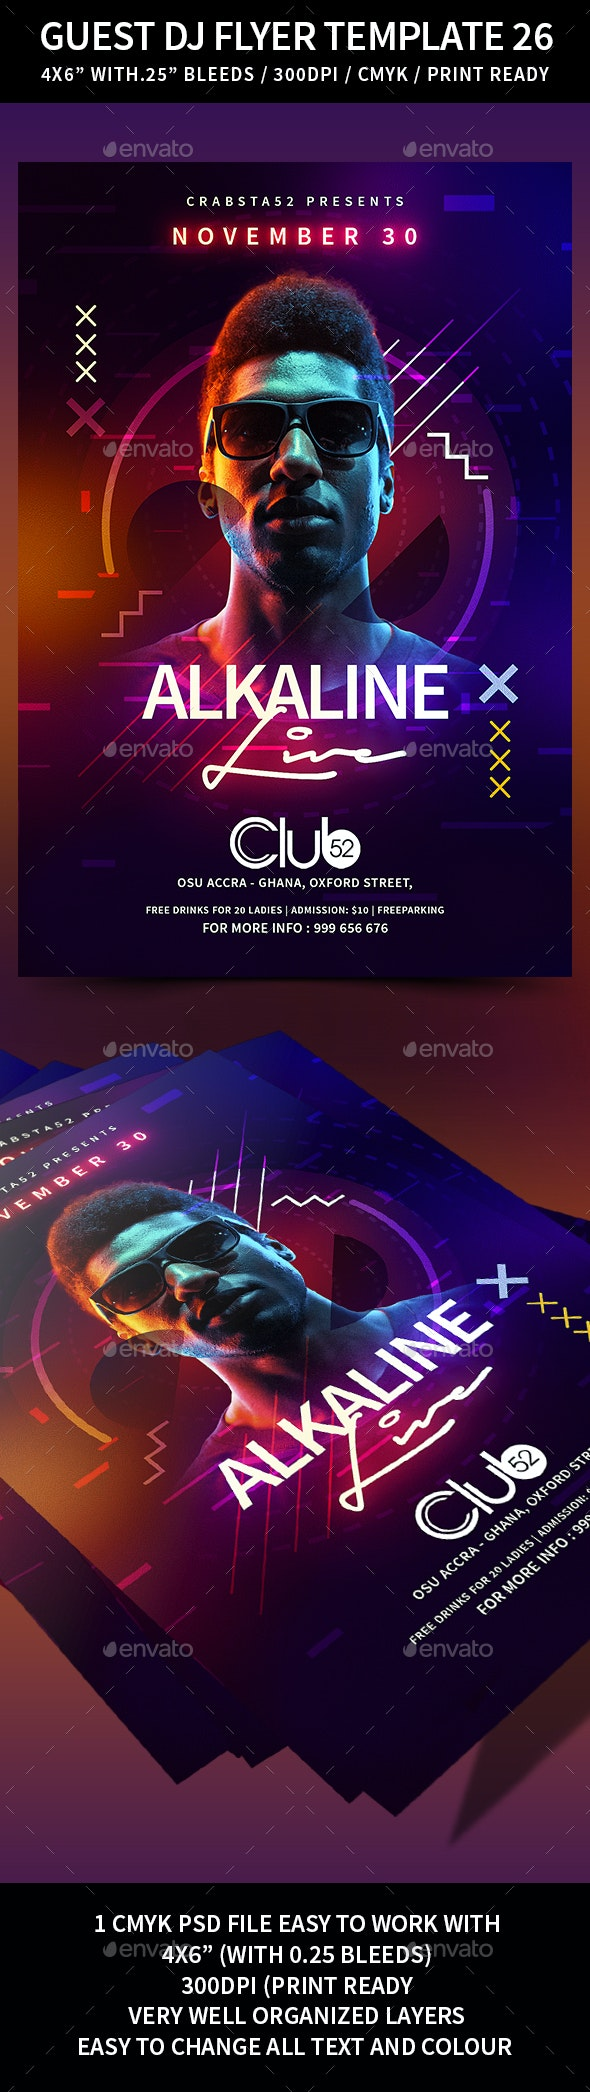 Guest Dj Flyer Template 26 - Clubs & Parties Events